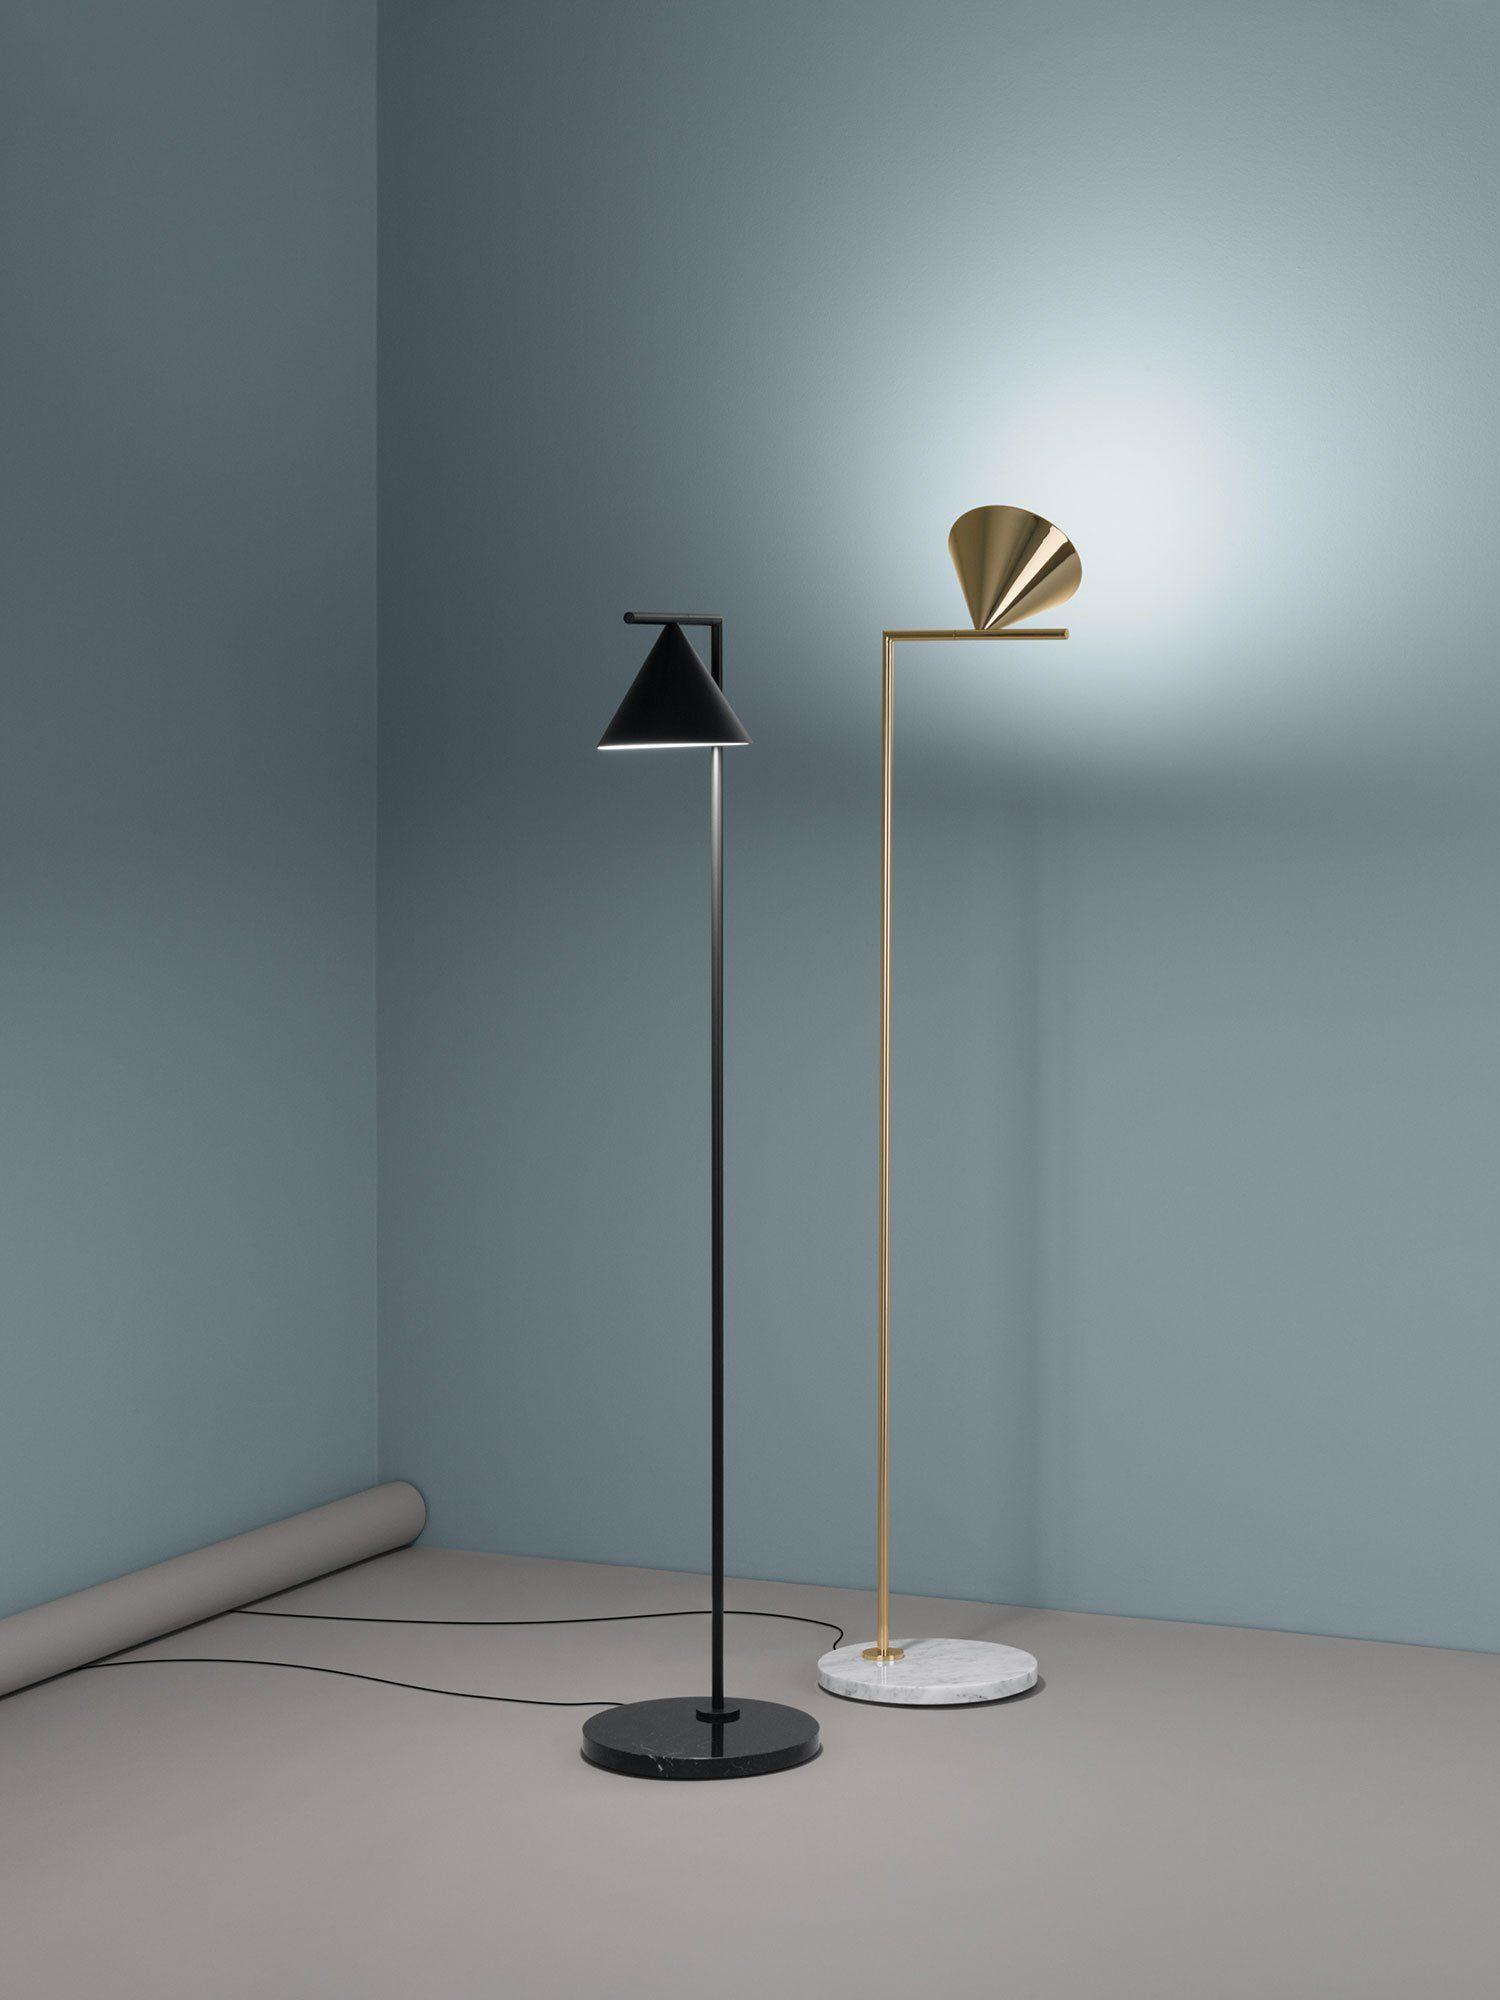 Best New Lighting At Euroluce 2015 Milantrace2015 Floor Lamp Design Modern Floor Lamps Floor Lamp